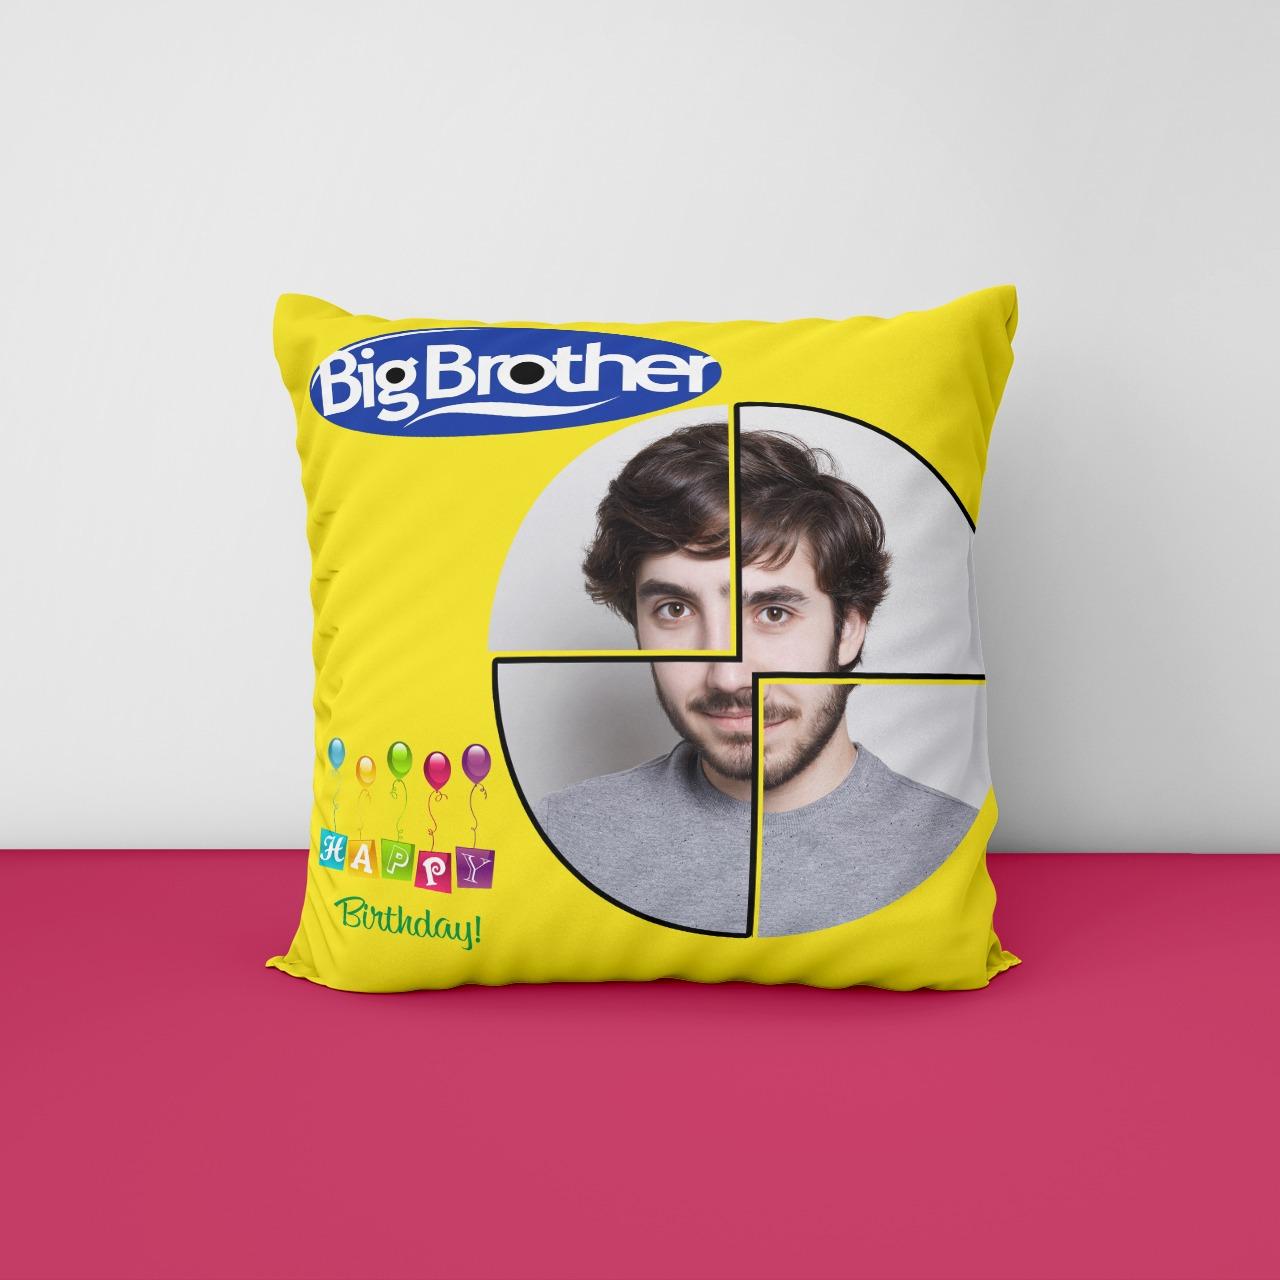 Big Brother Birthday Personalized Cushion